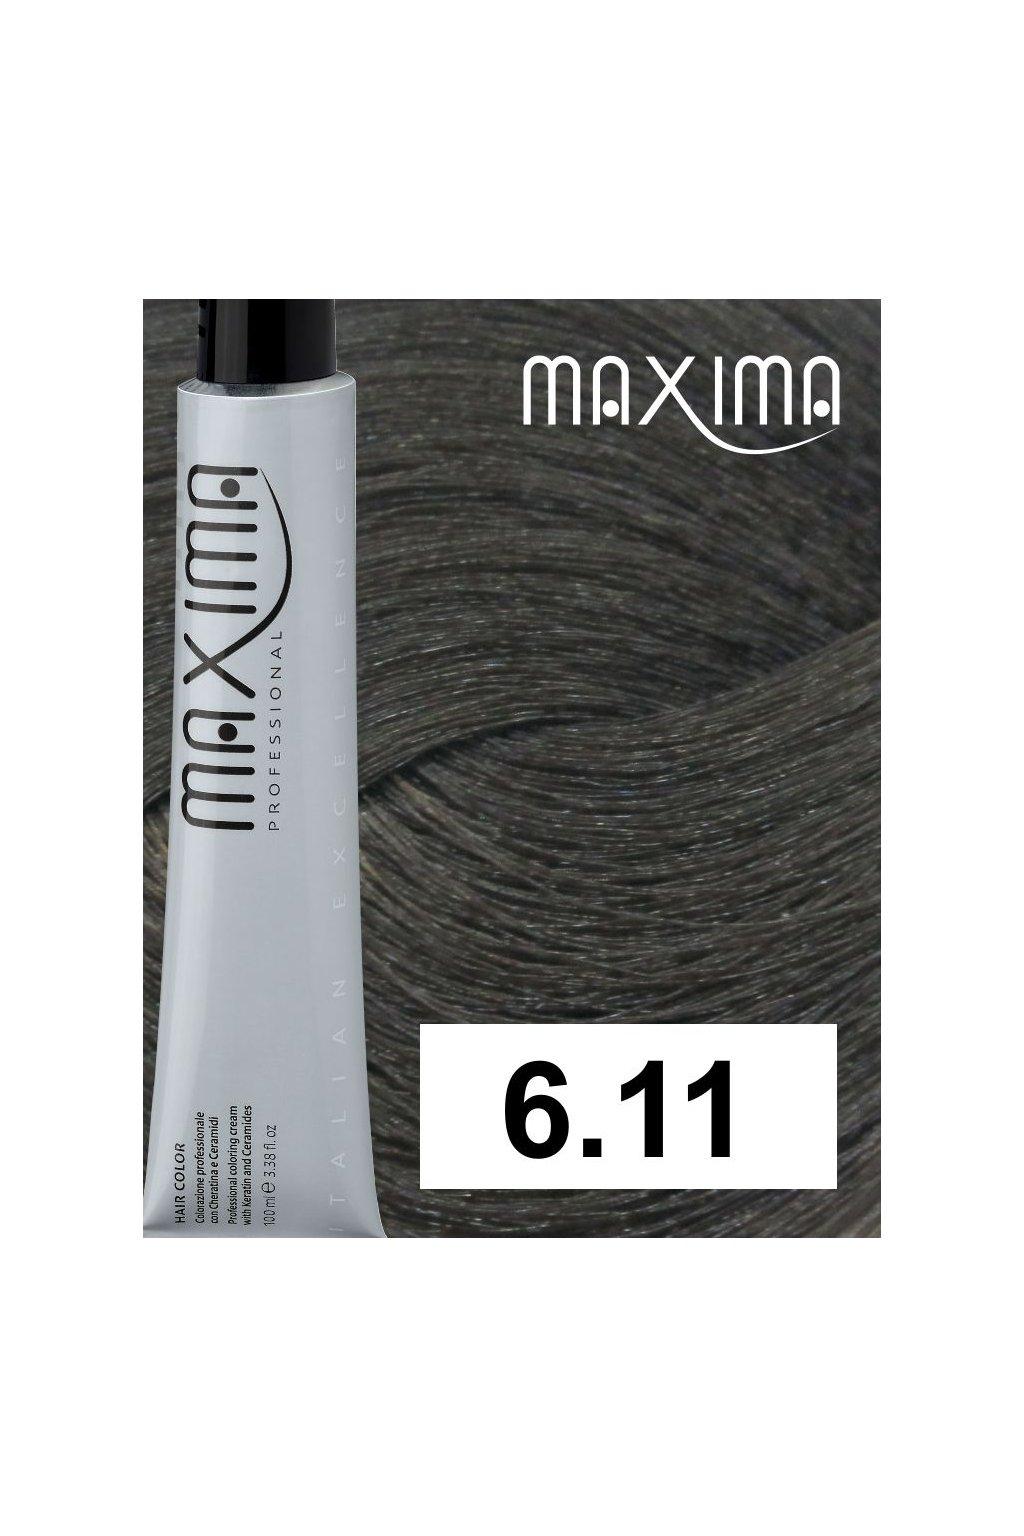 6 11 max